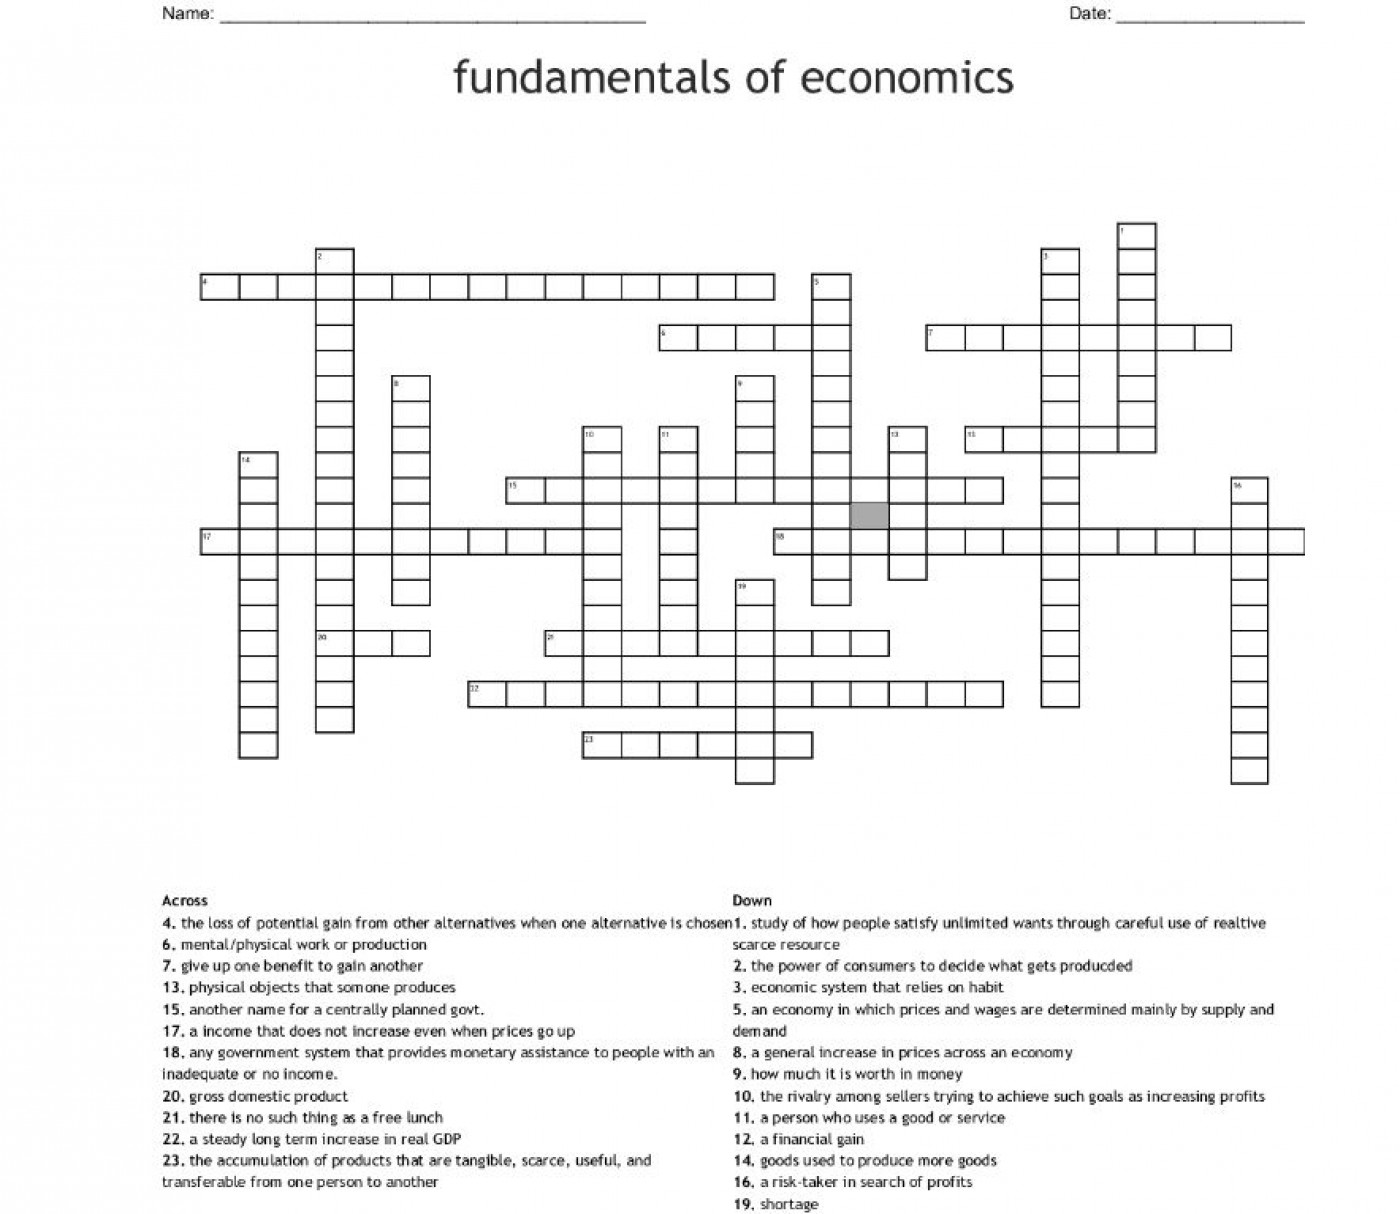 001 Imposing Prosperity Crossword Picture  National Economic Clue Nyt Prosperou 11 Letter 101400